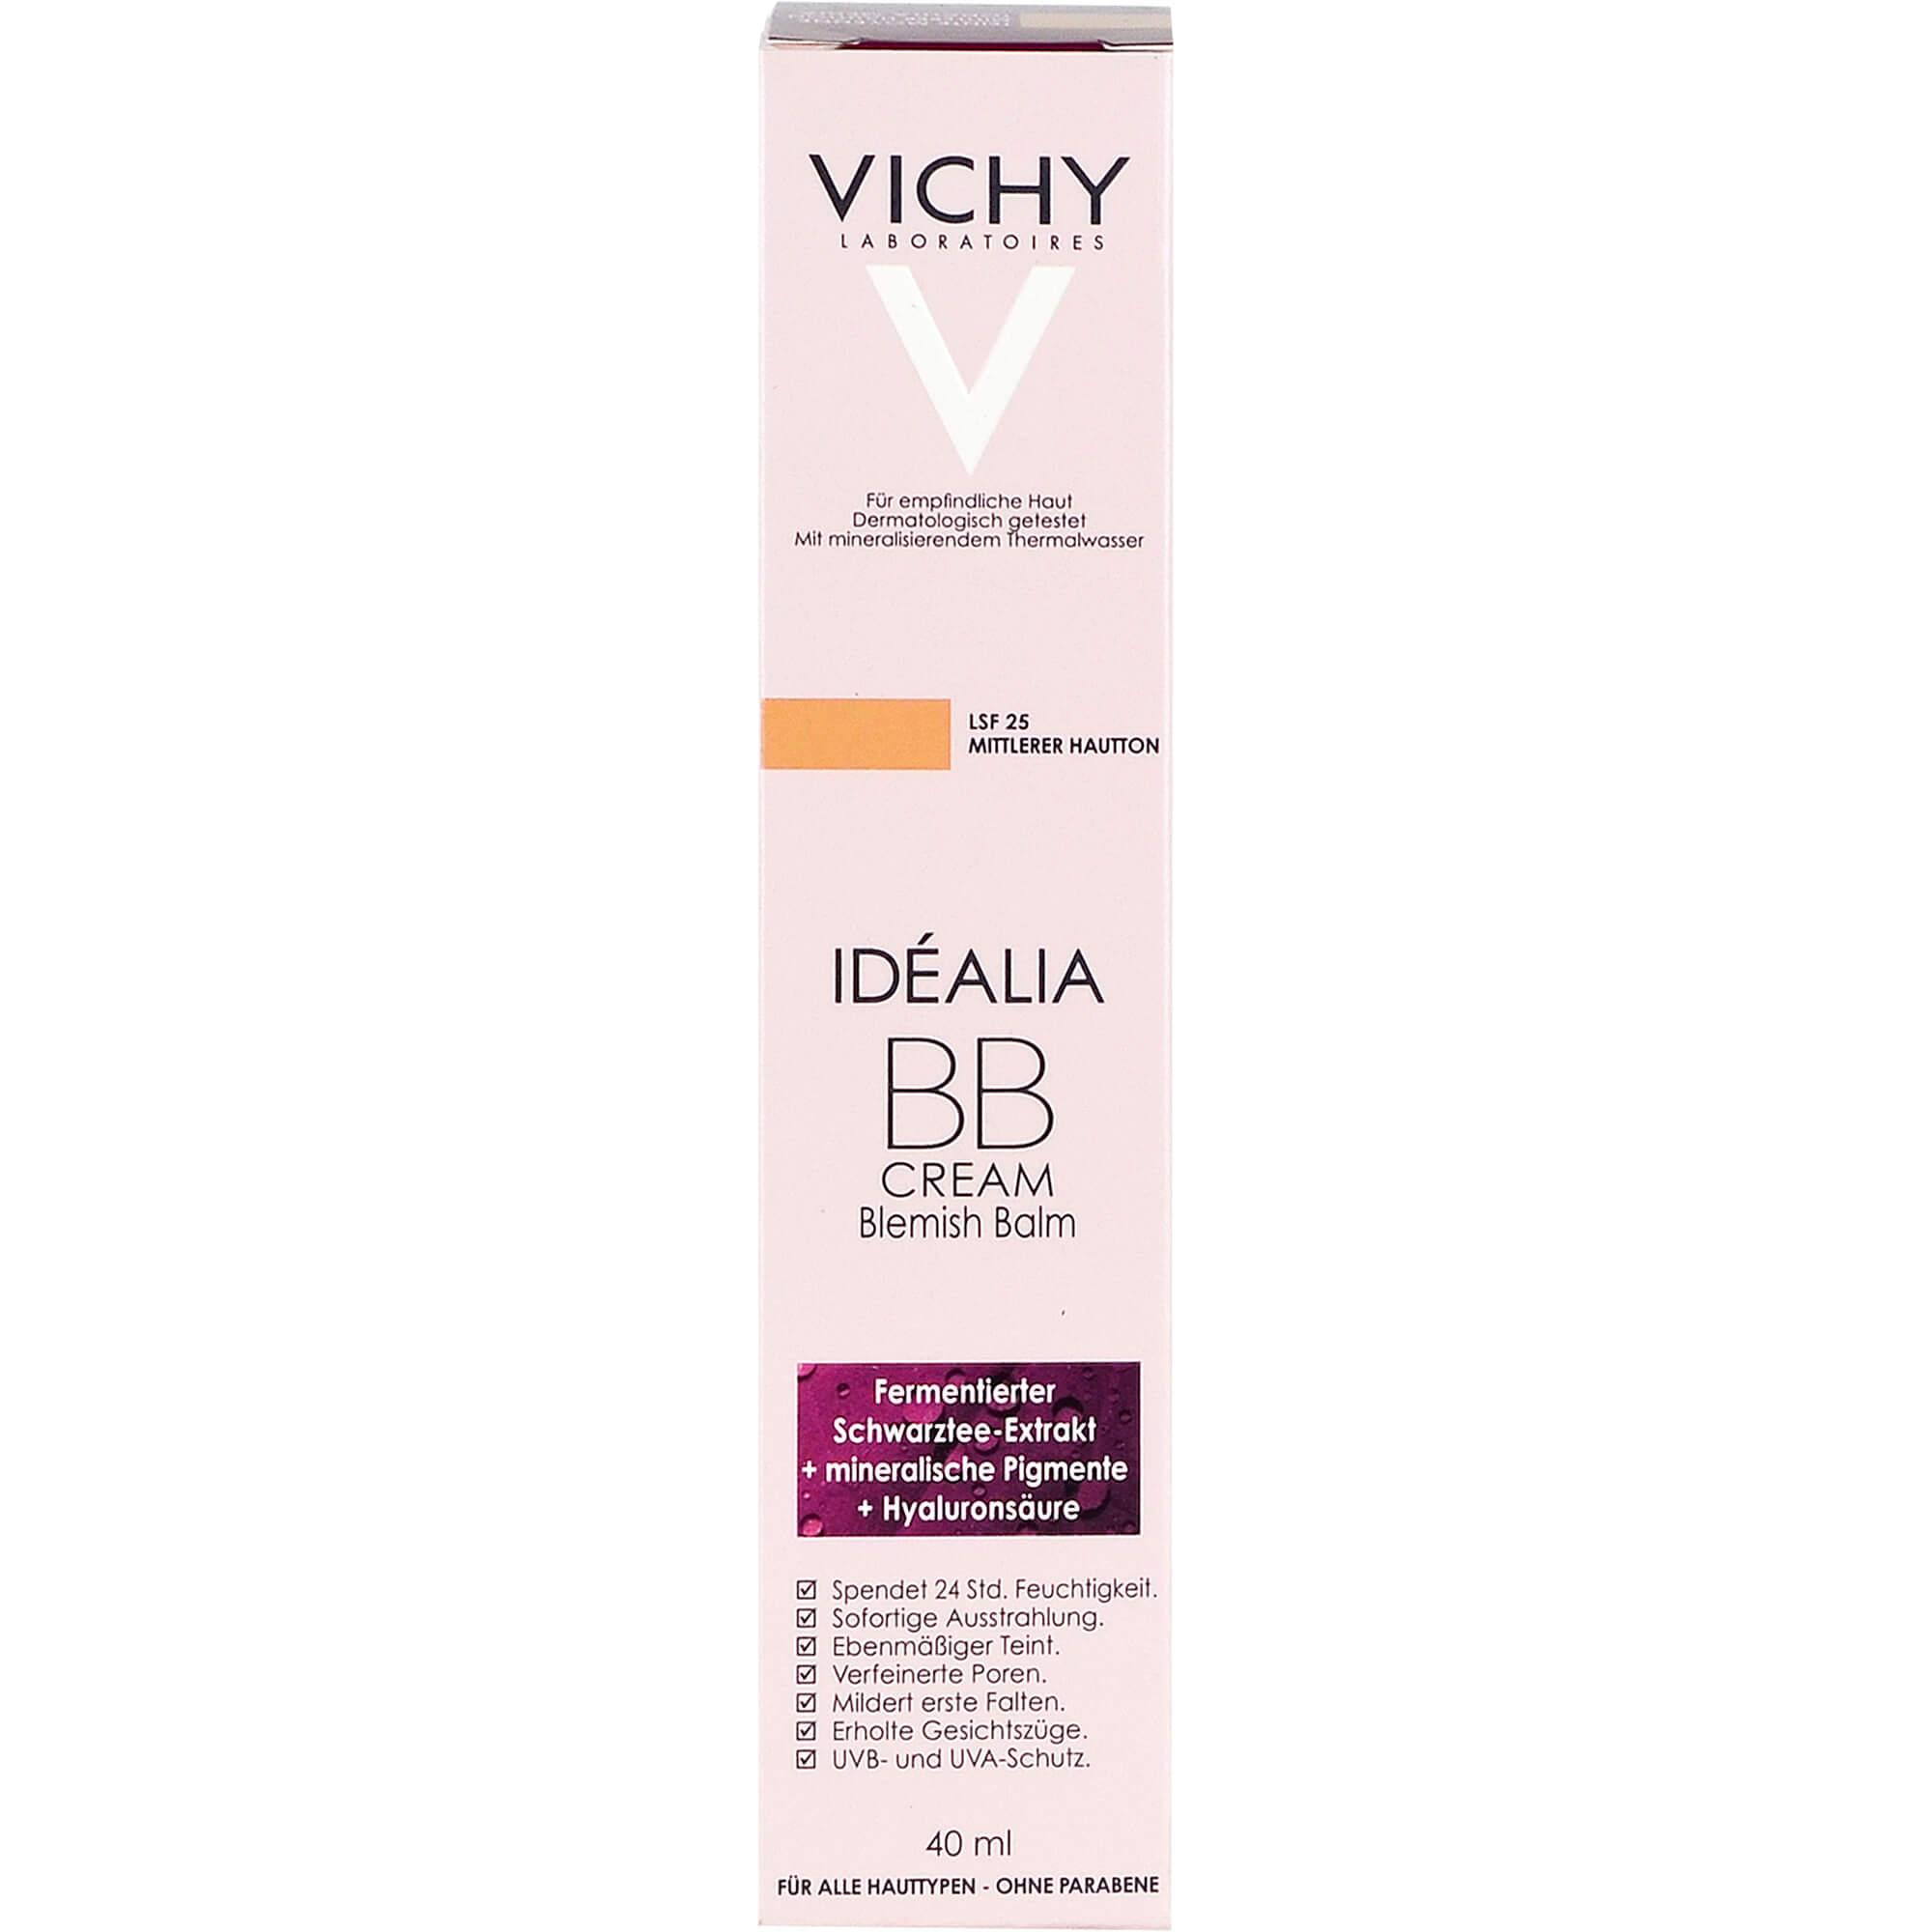 VICHY IDEALIA BB Cream mittel